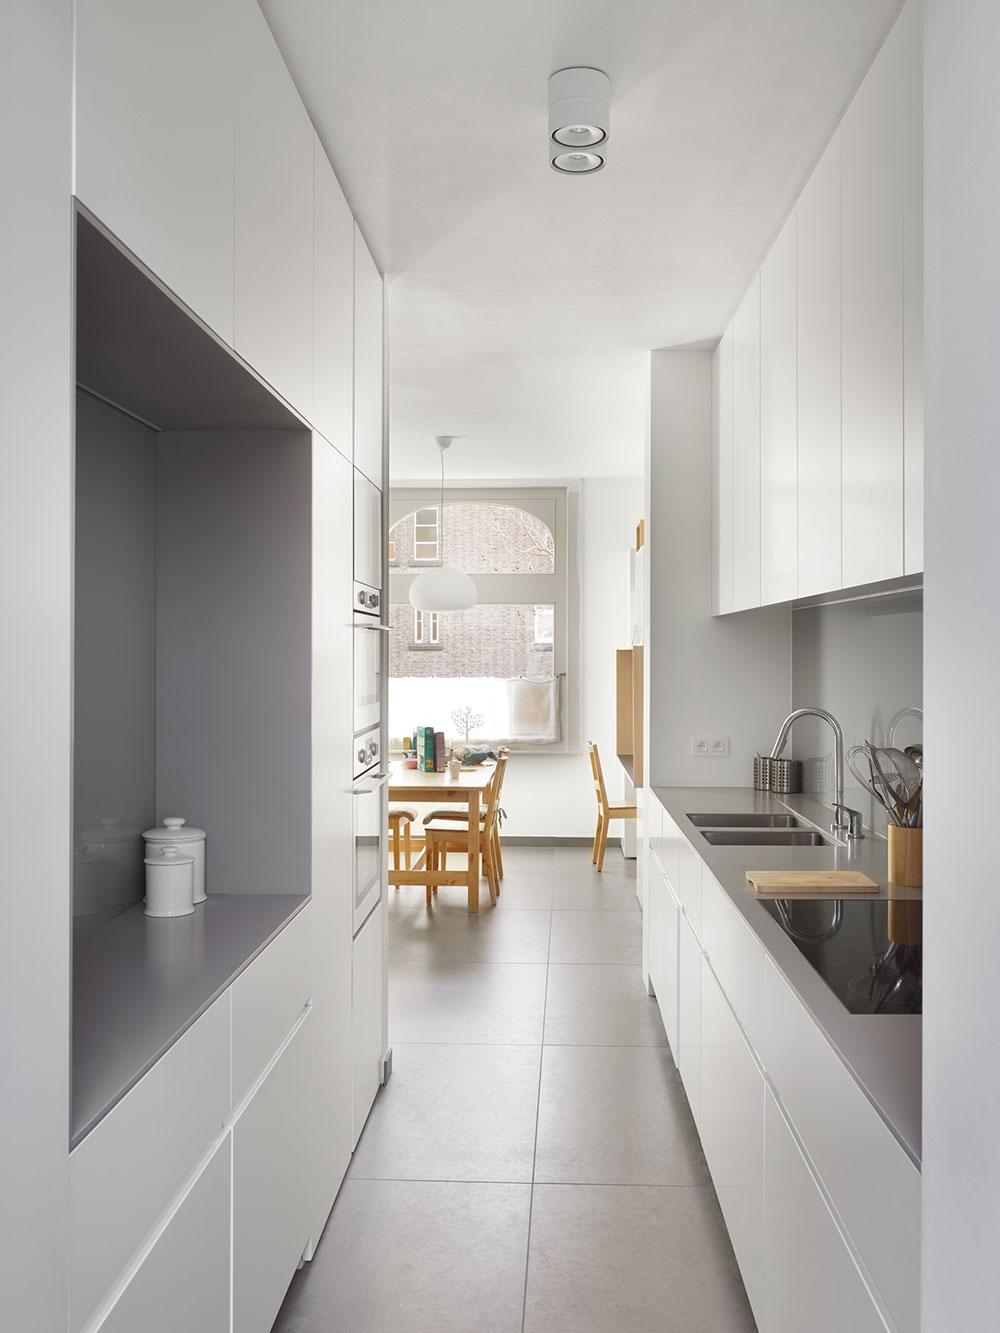 Woning D. L. Interieur Keuken